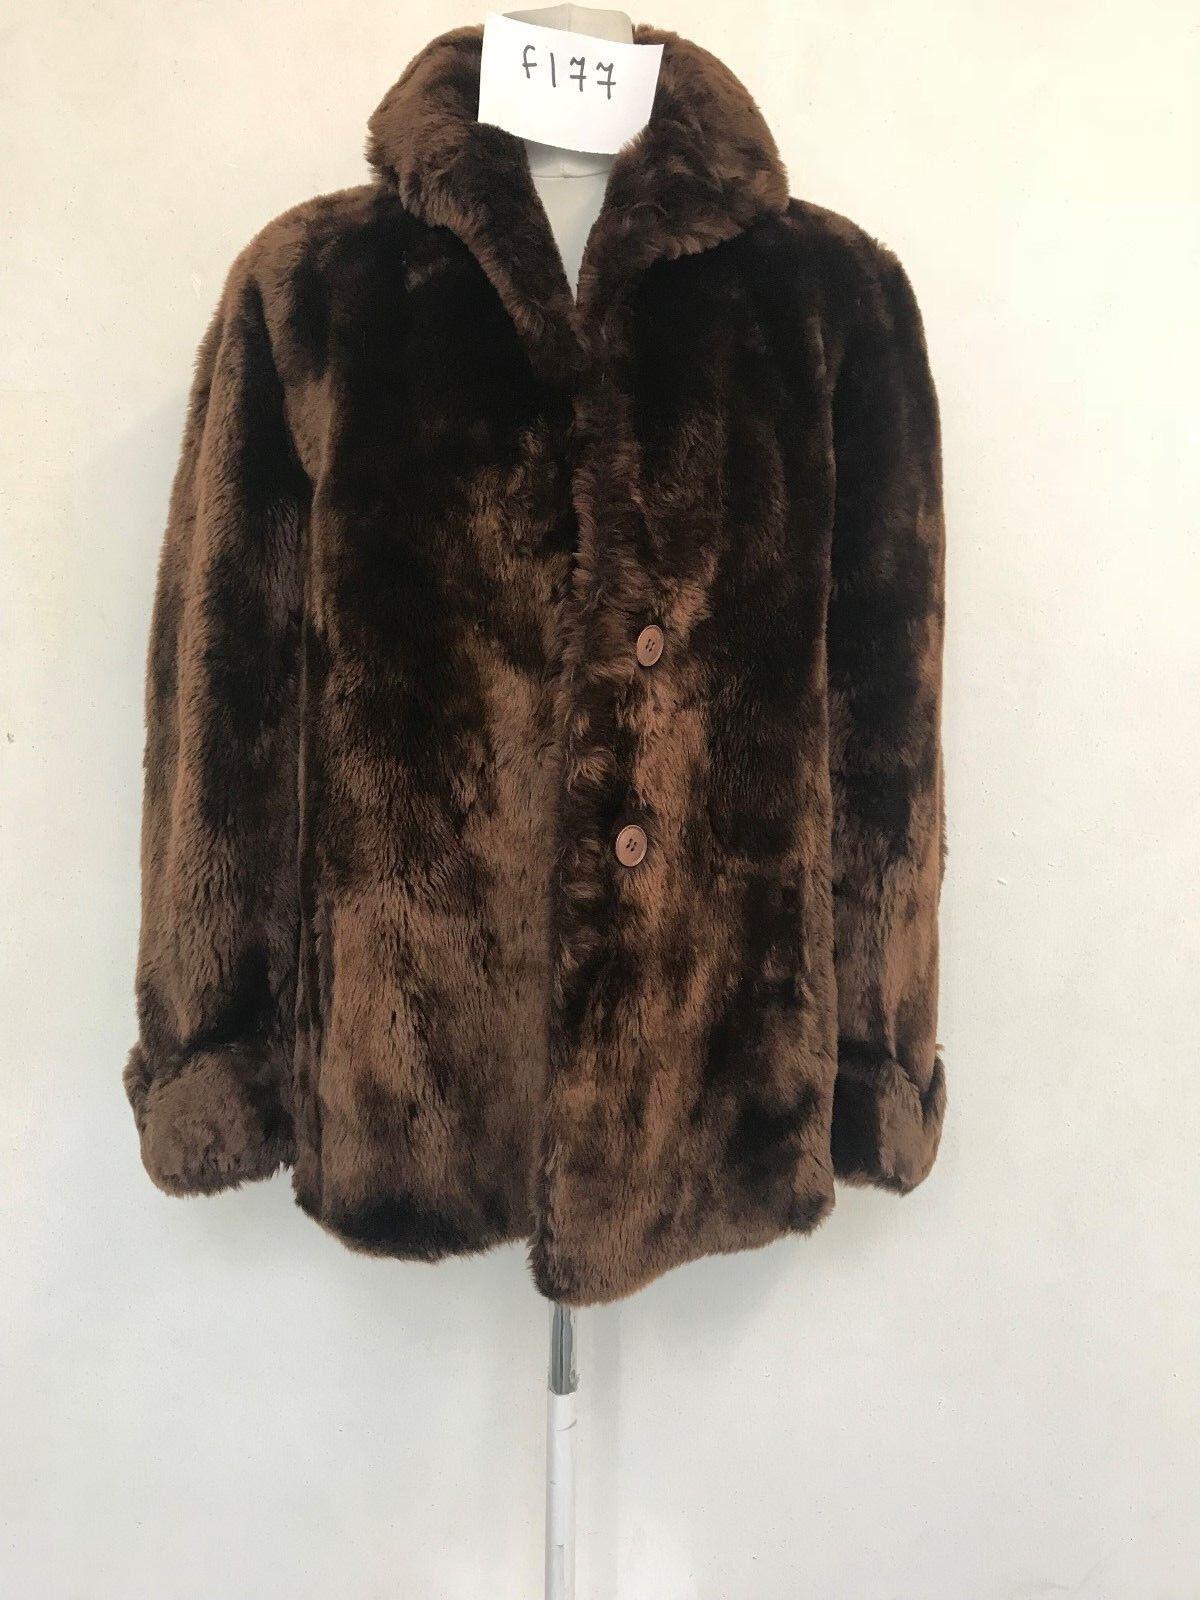 Ladies VINTAGE REAL FUR Coat in Brown Armpit armpit 22  Length 29  (f177)